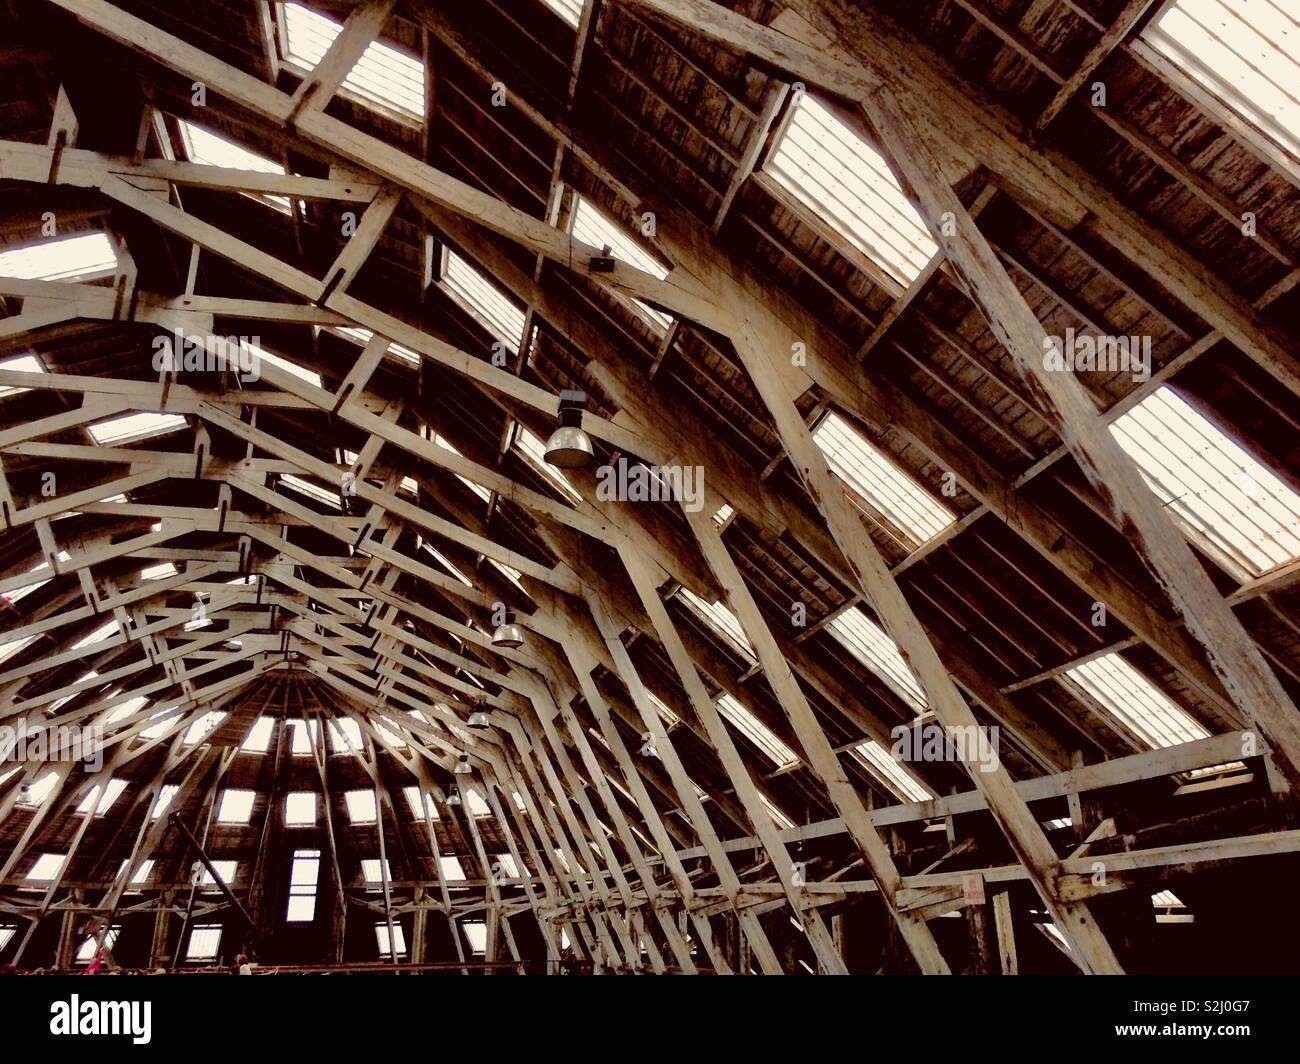 Roof at Chatham historic Dockyard - Stock Image